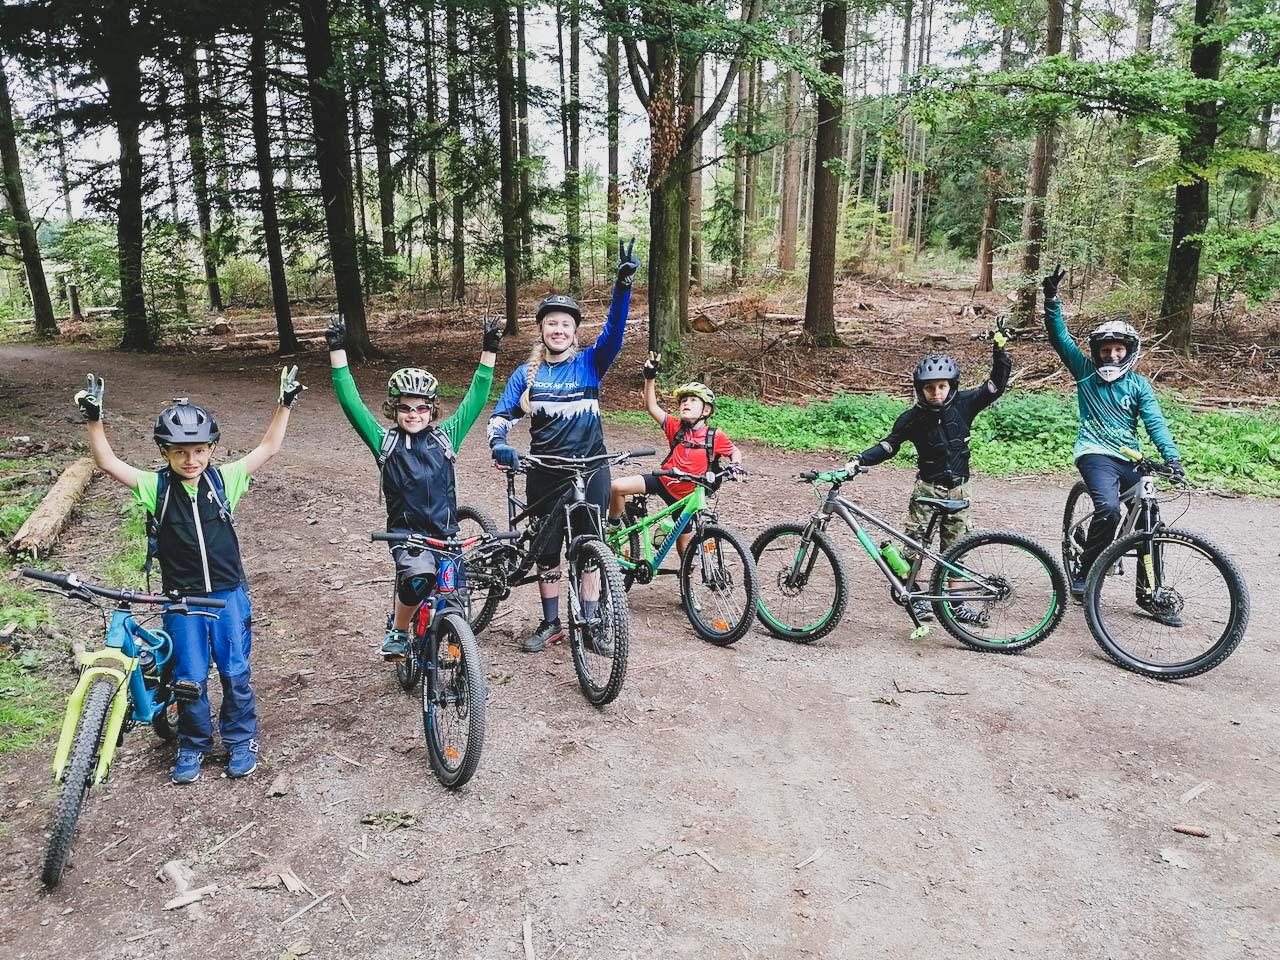 Mountainbike Kinder Kurs in Nürnberg Franken Bayern - 8-12 Jahre Kids - Rock my Trail Fahrtechnik Bikeschule